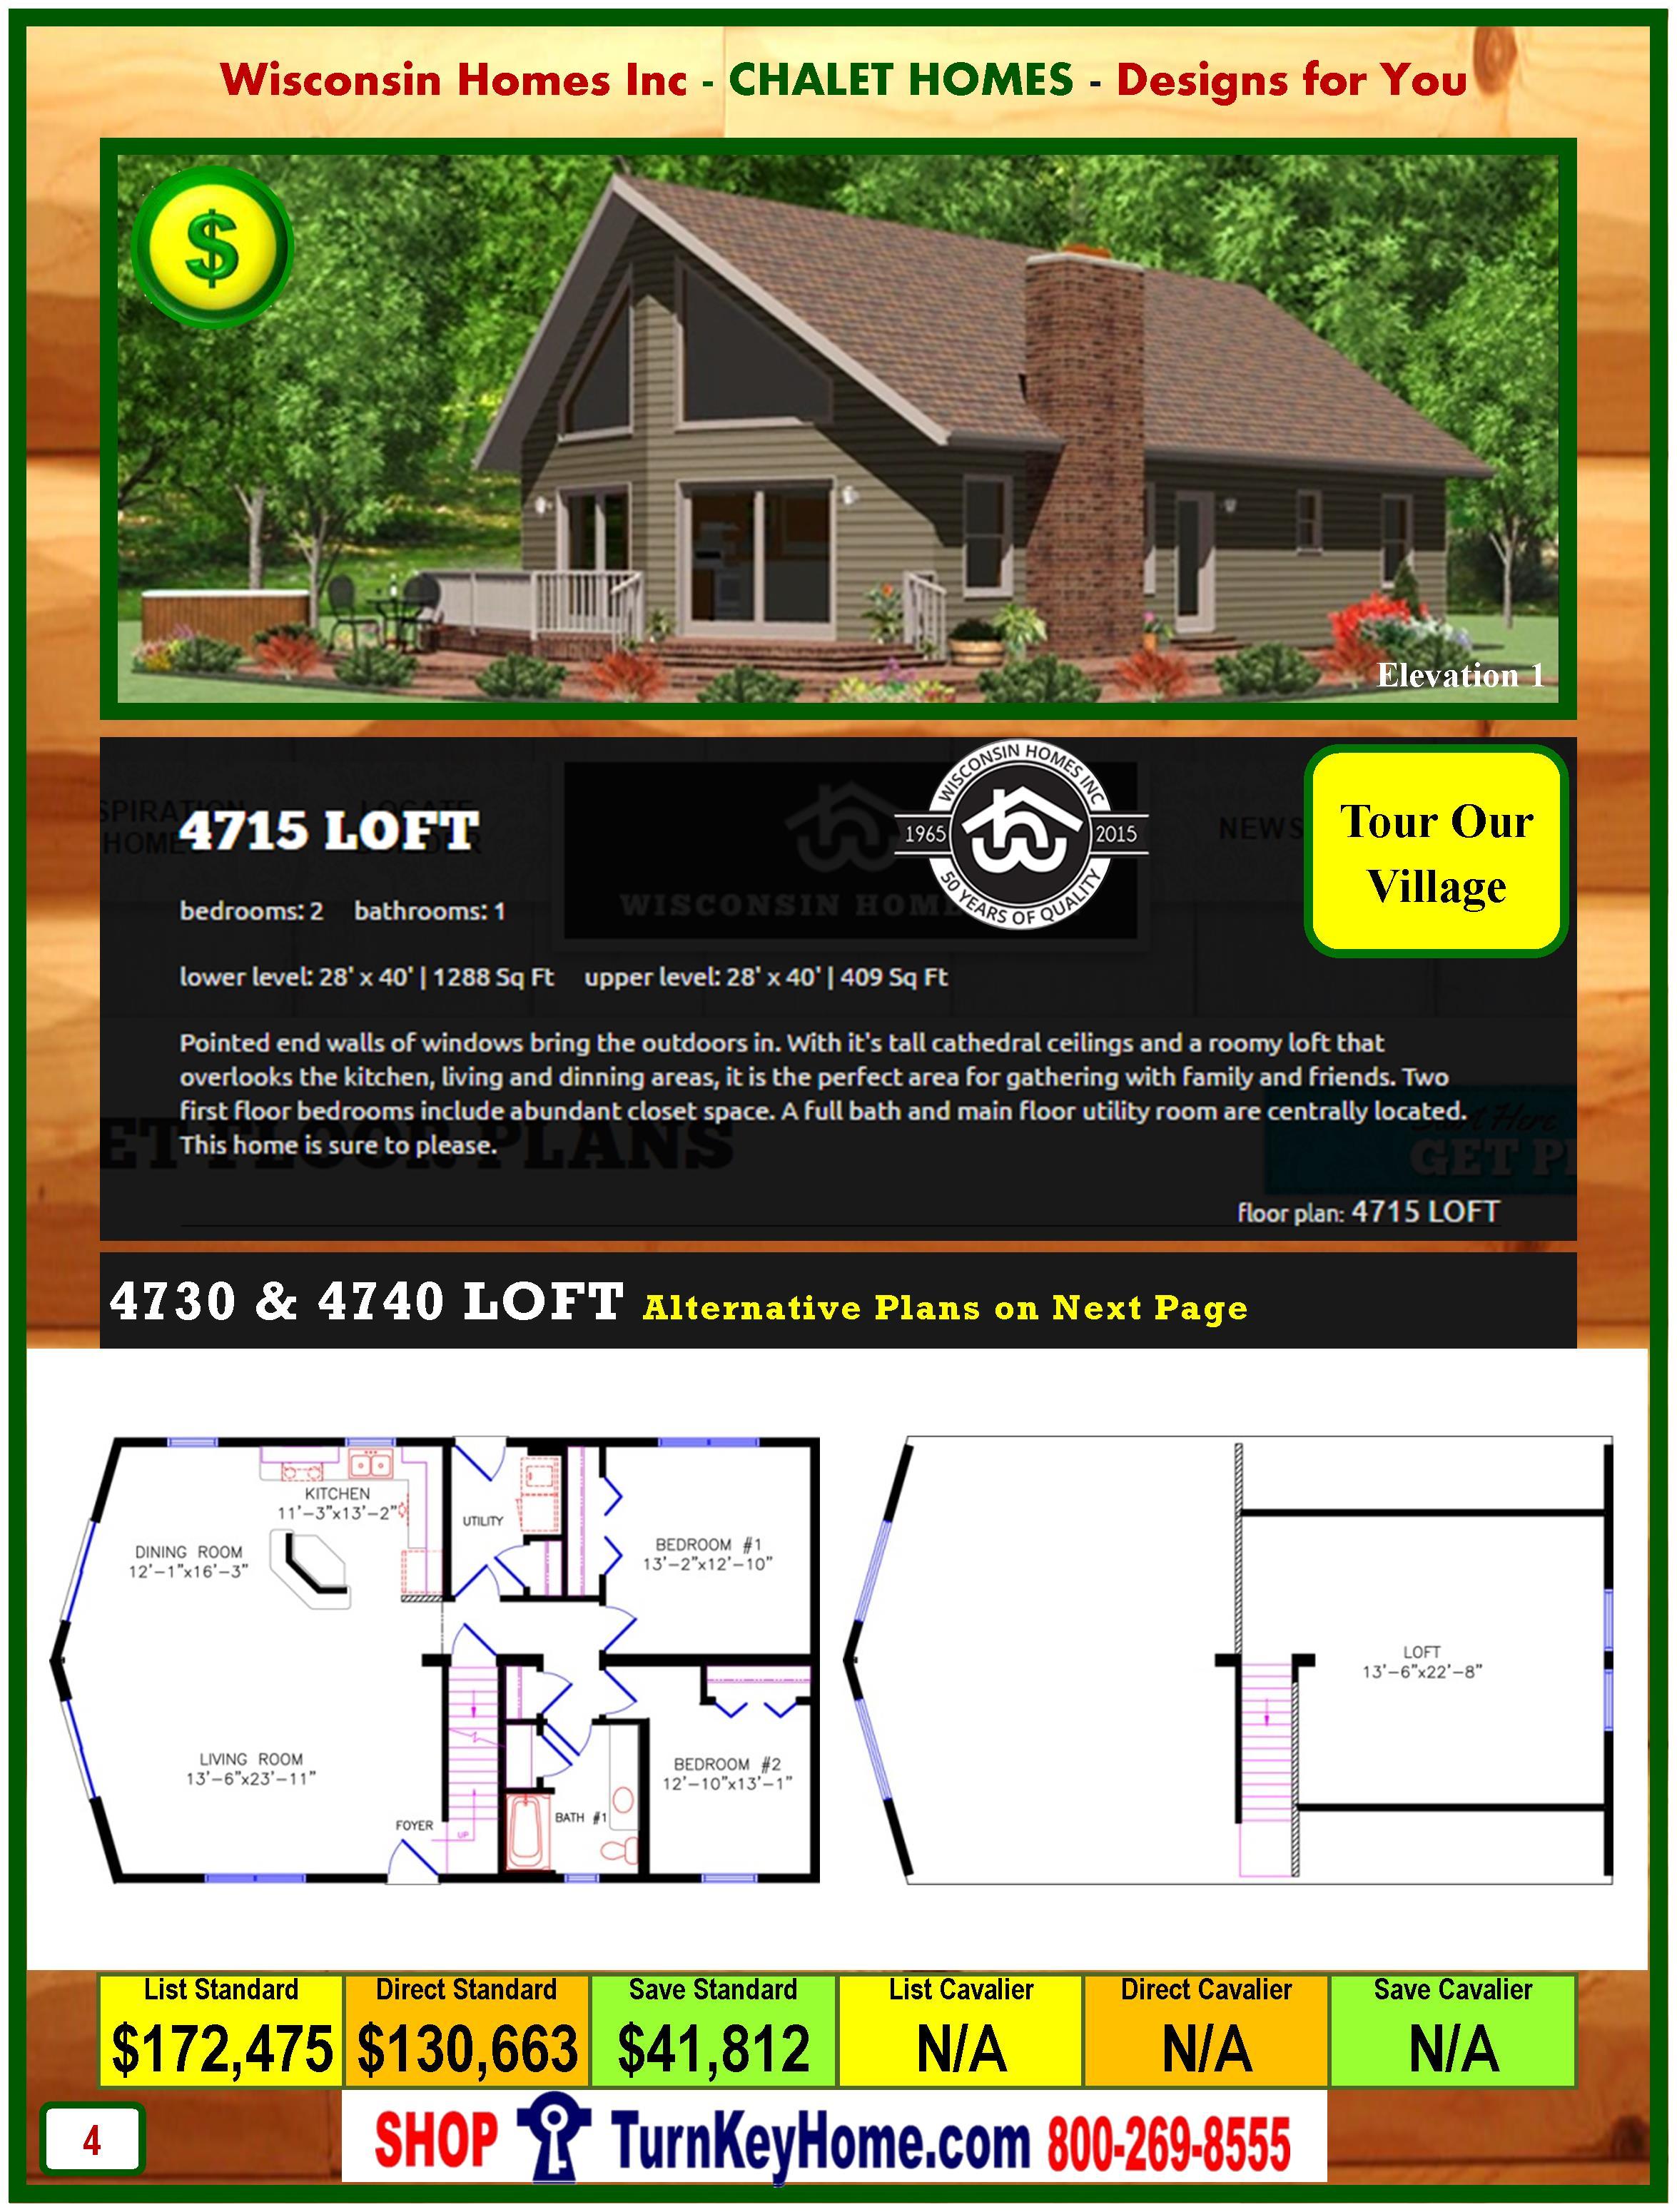 Modular.Home.Catalog.Wisconsin.Homes.Inc.Chalet.Loft.4715.1.P4.1215